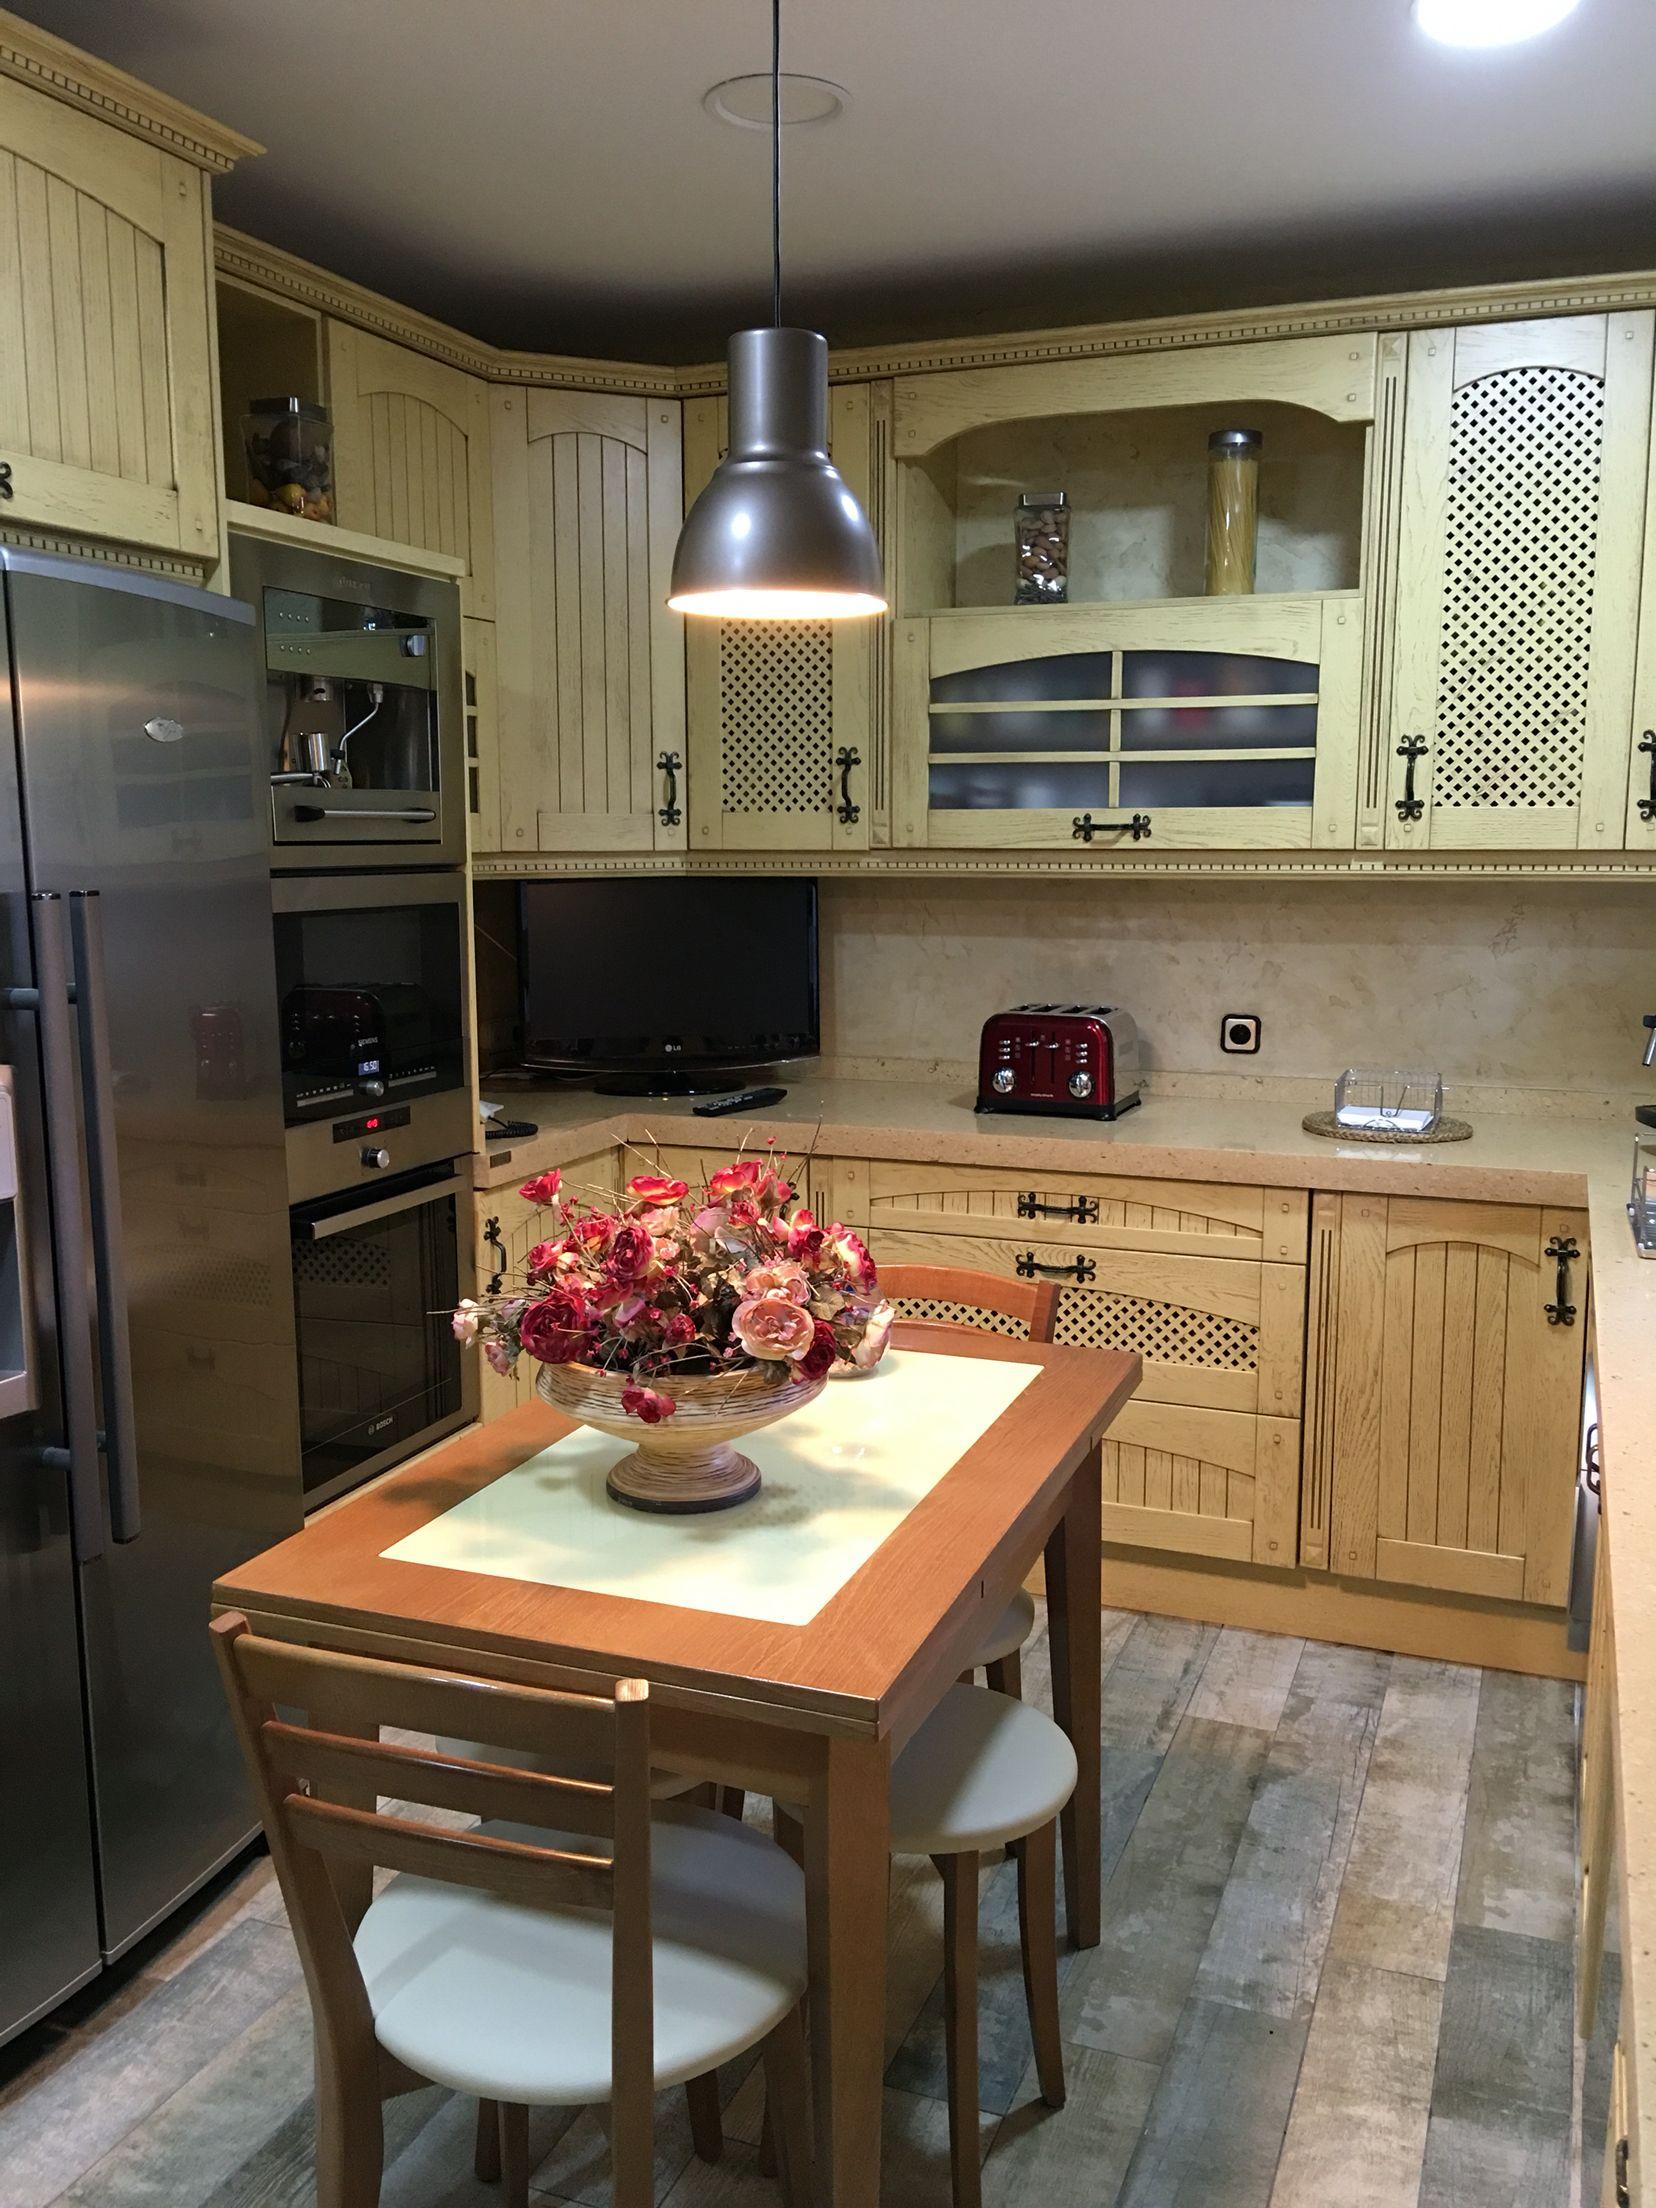 Atractivo Resurgir Muebles De Cocina Pintan Ideas Ornamento ...